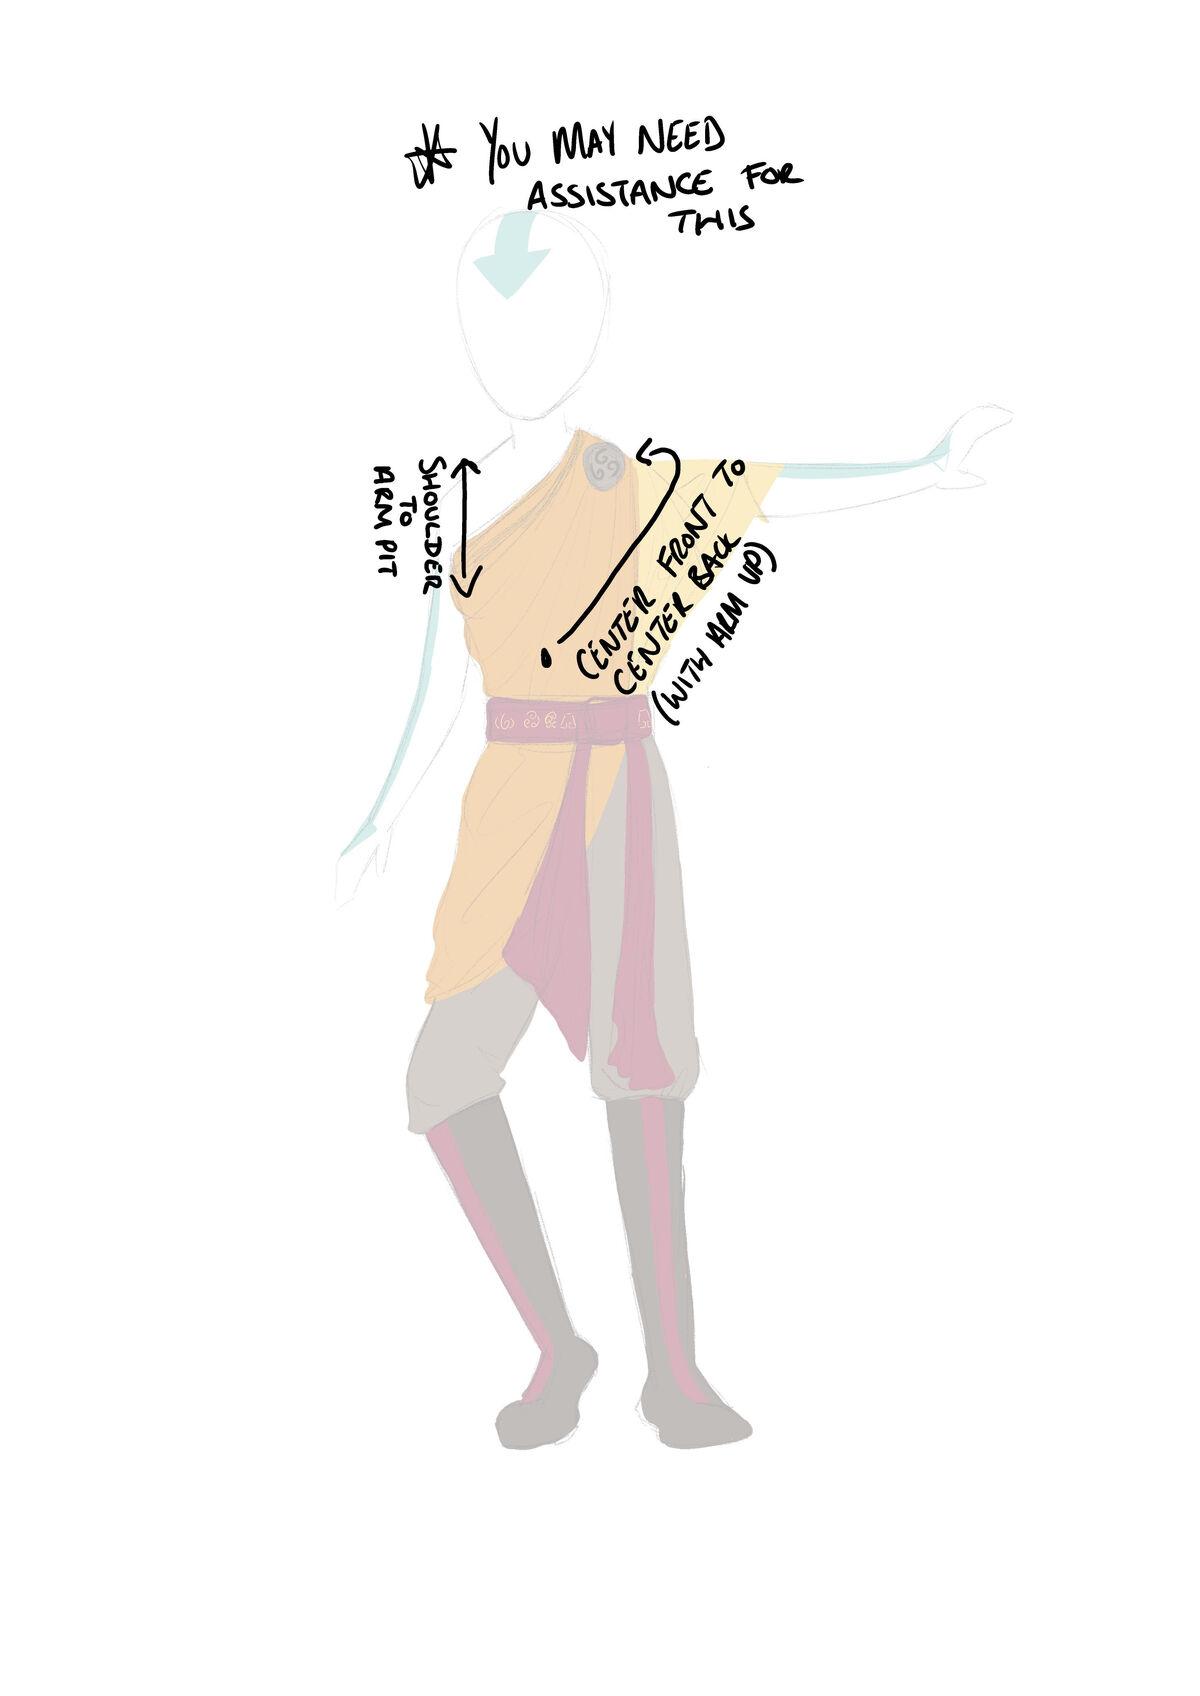 Avatar Aang cosplay Measurements Guide